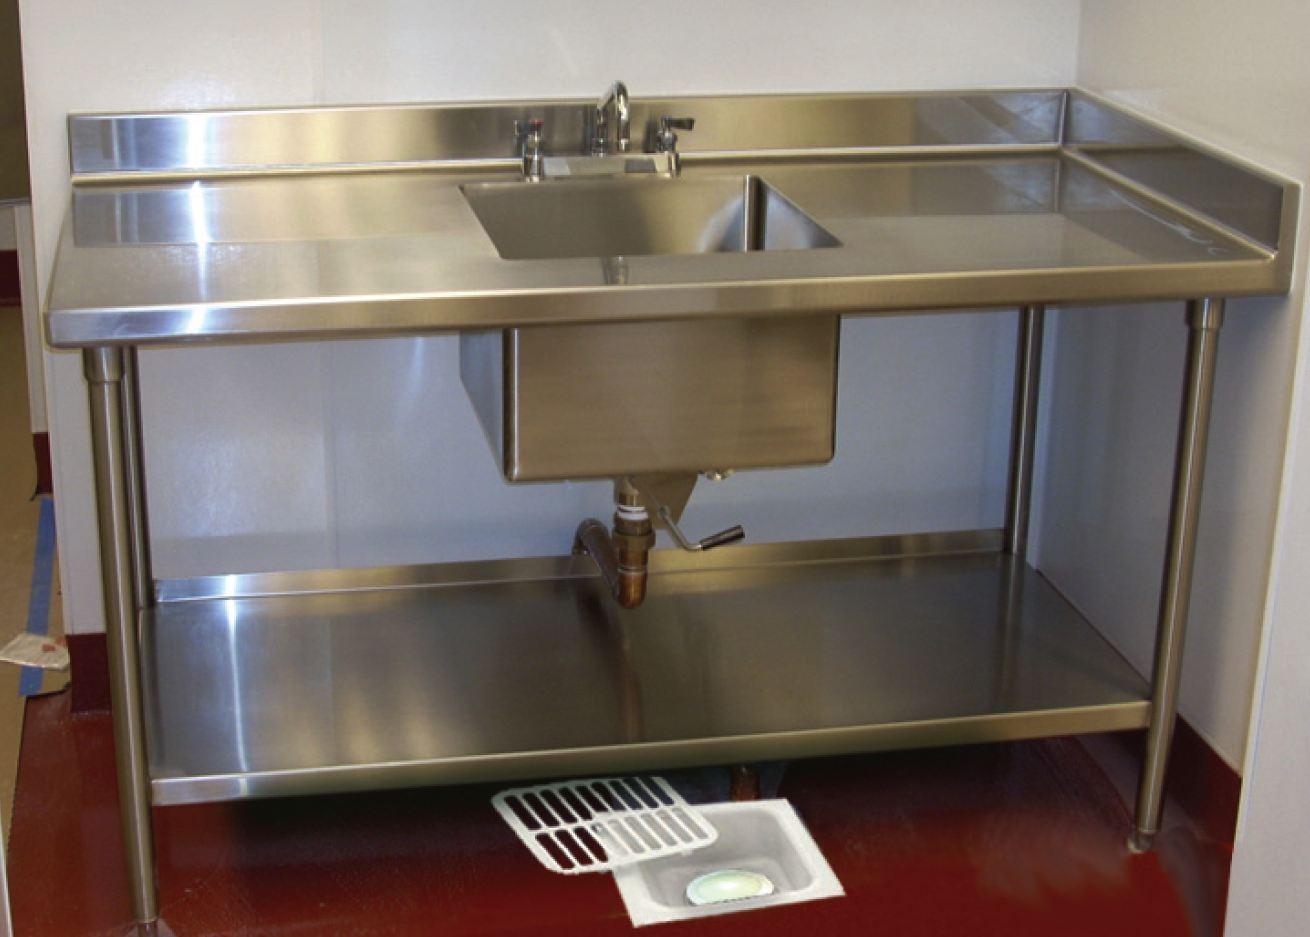 Floor Sink Drain Flooring Ideas And Inspiration